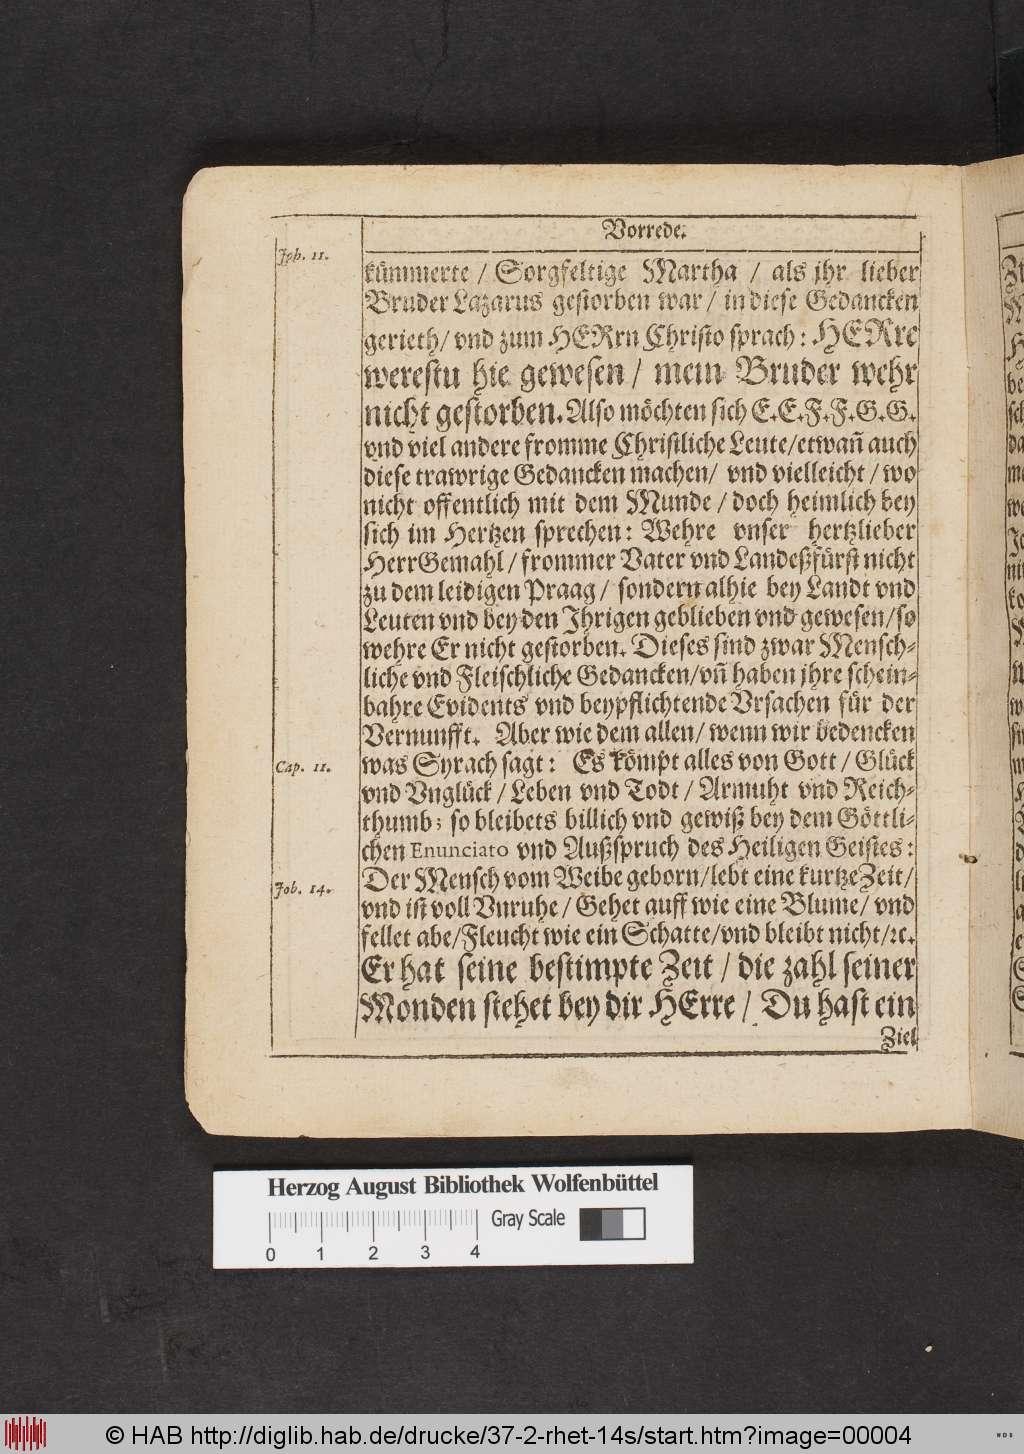 http://diglib.hab.de/drucke/37-2-rhet-14s/00004.jpg